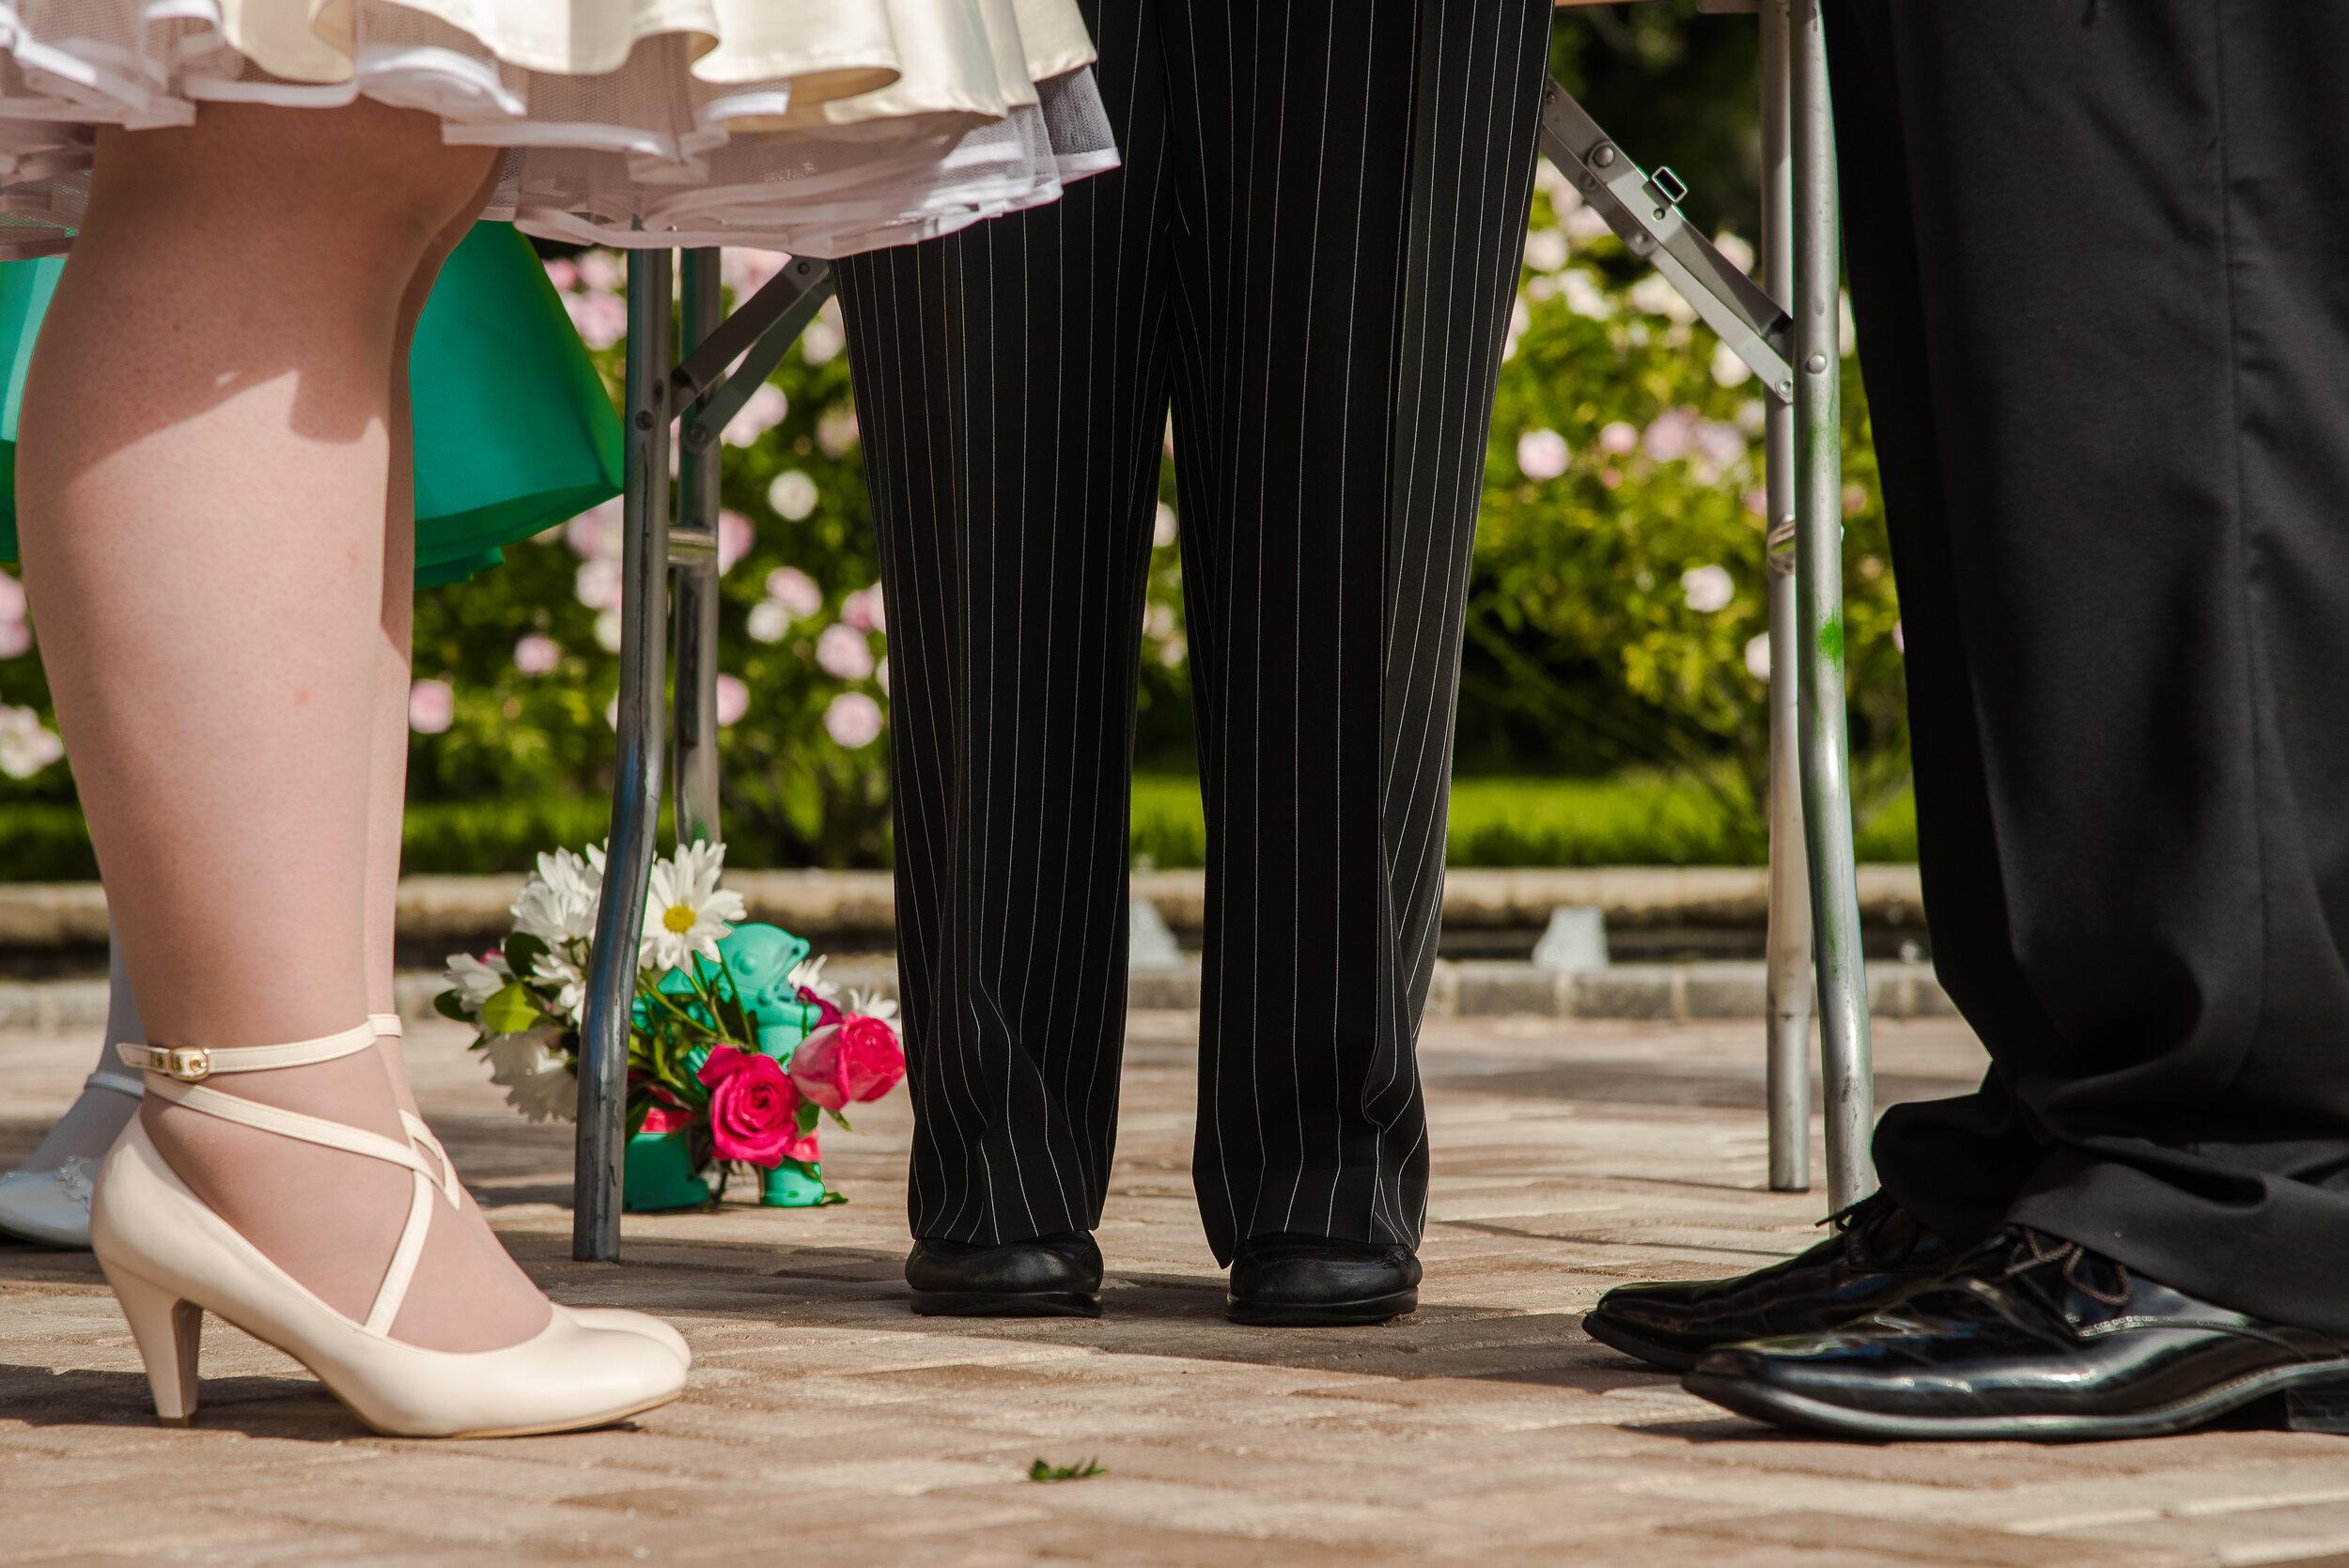 herry-garden-wedding-1-66.jpg